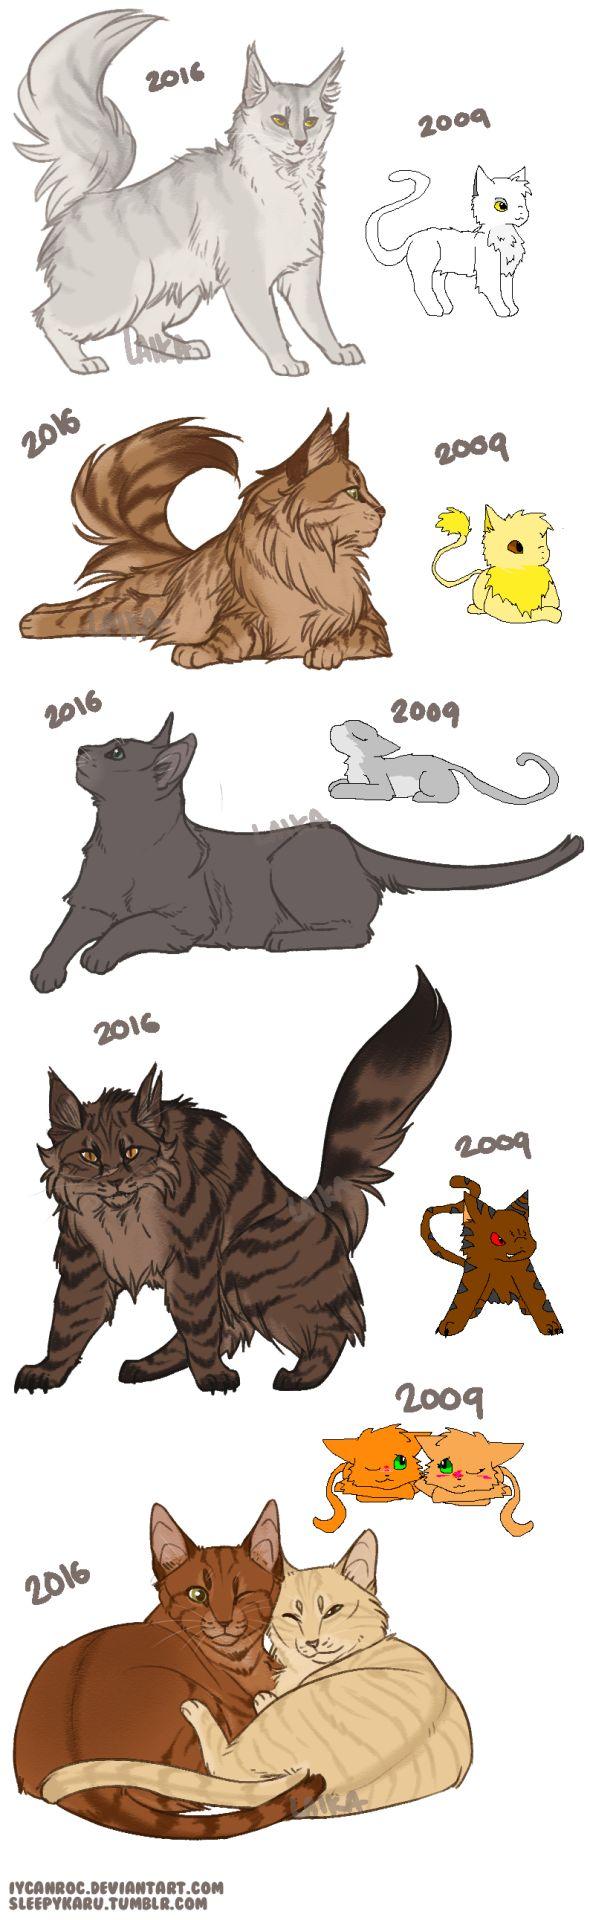 warrior cats | Tumblr